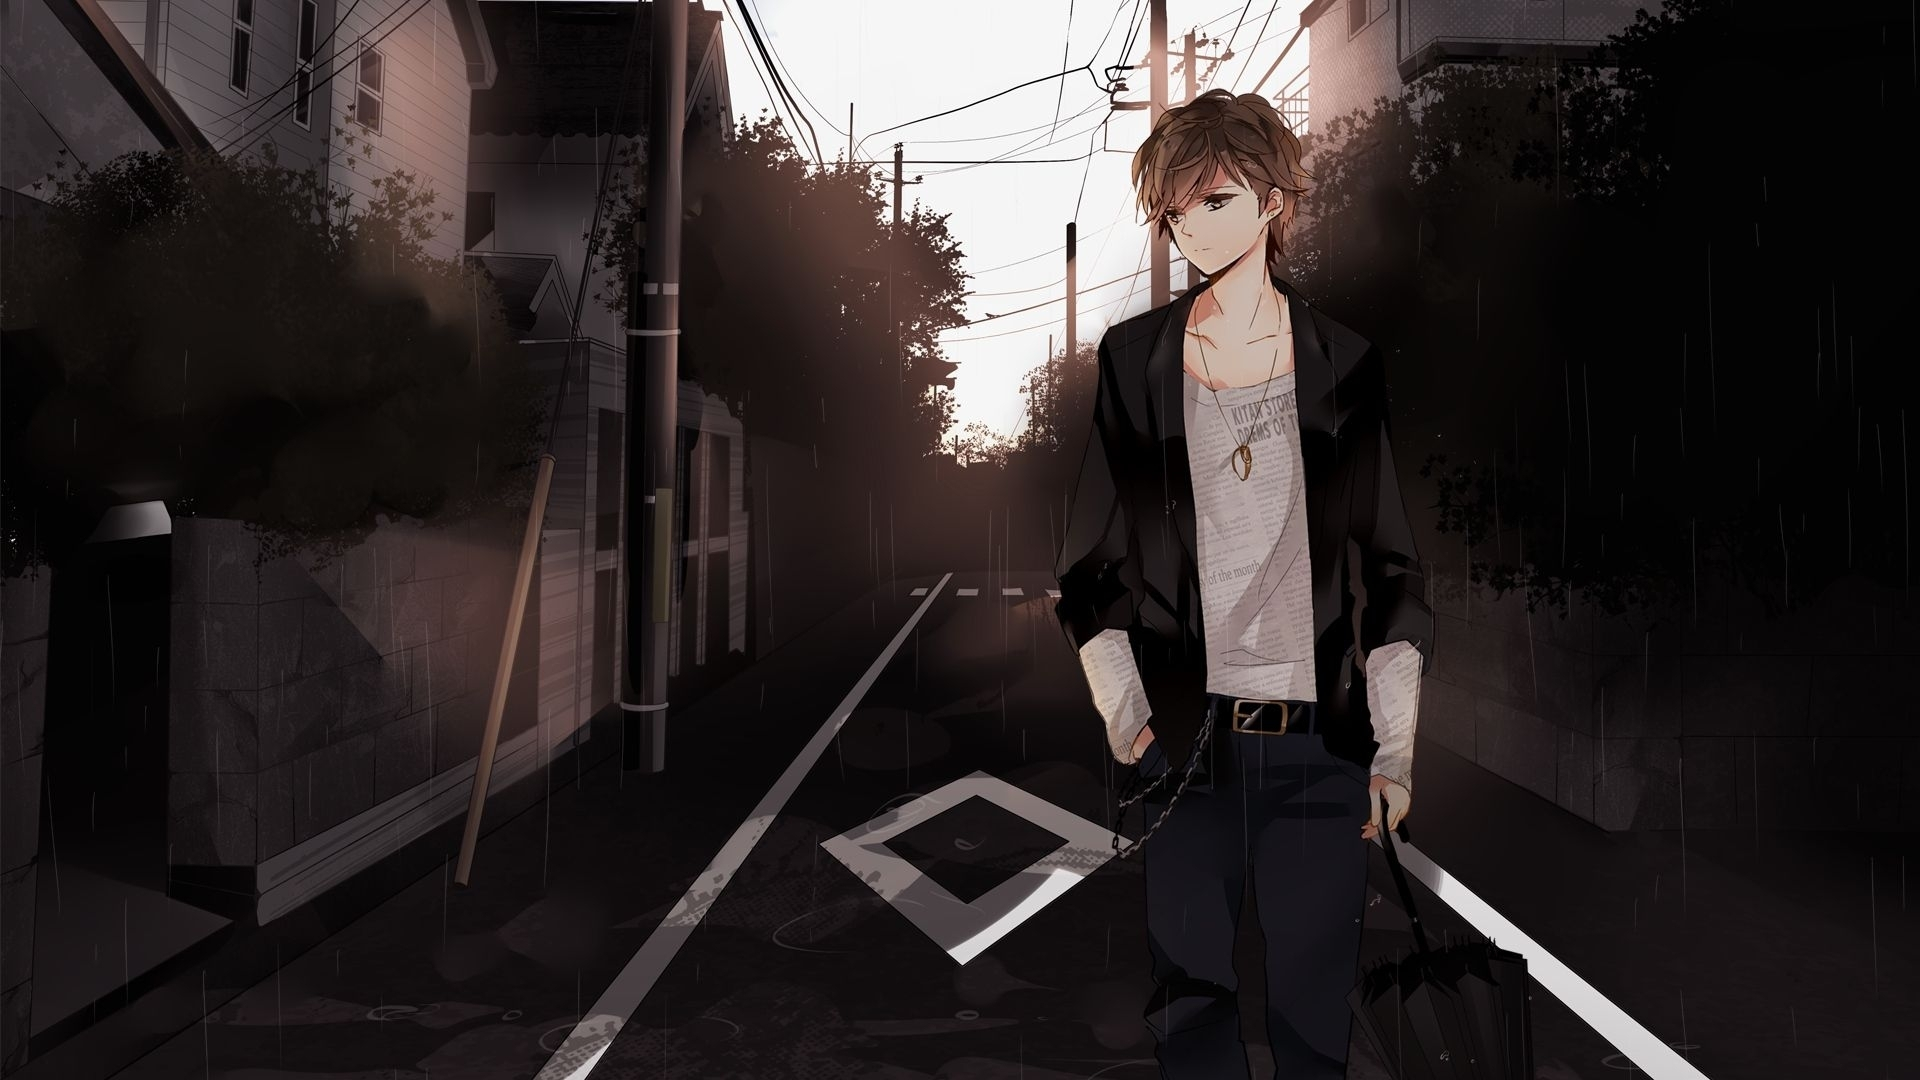 sad anime boy wallpaper hd anime guy wallpapers wallpaper cave